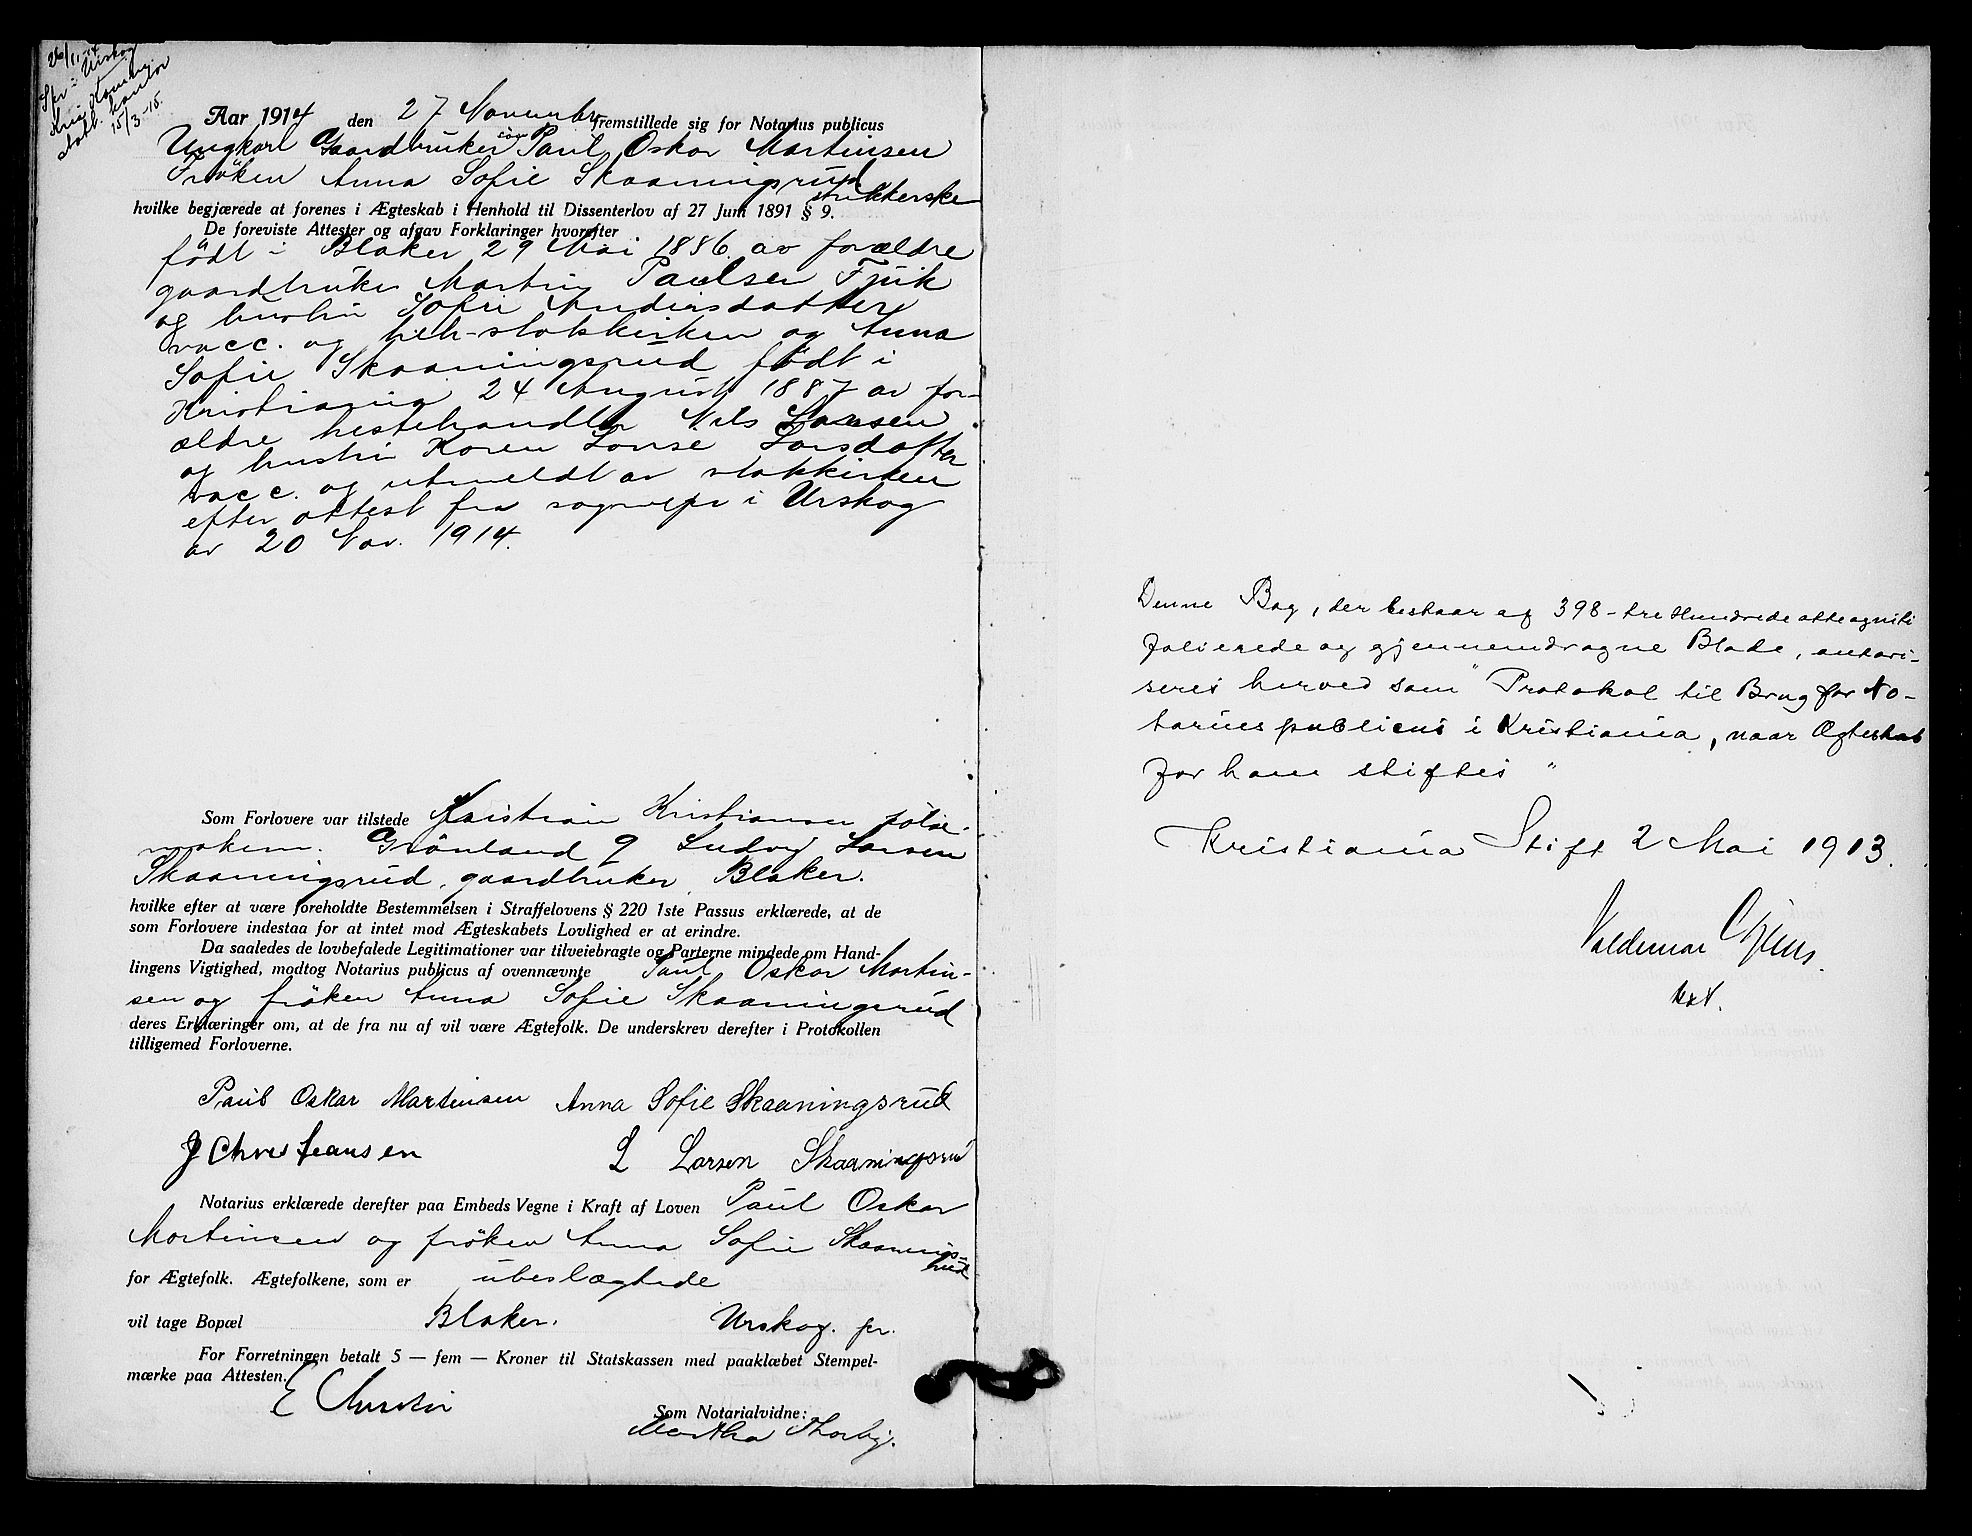 SAO, Oslo byfogd avd. I, L/Lb/Lbb/L0009: Notarialprotokoll, rekke II: Vigsler, 1913-1914, s. 398b